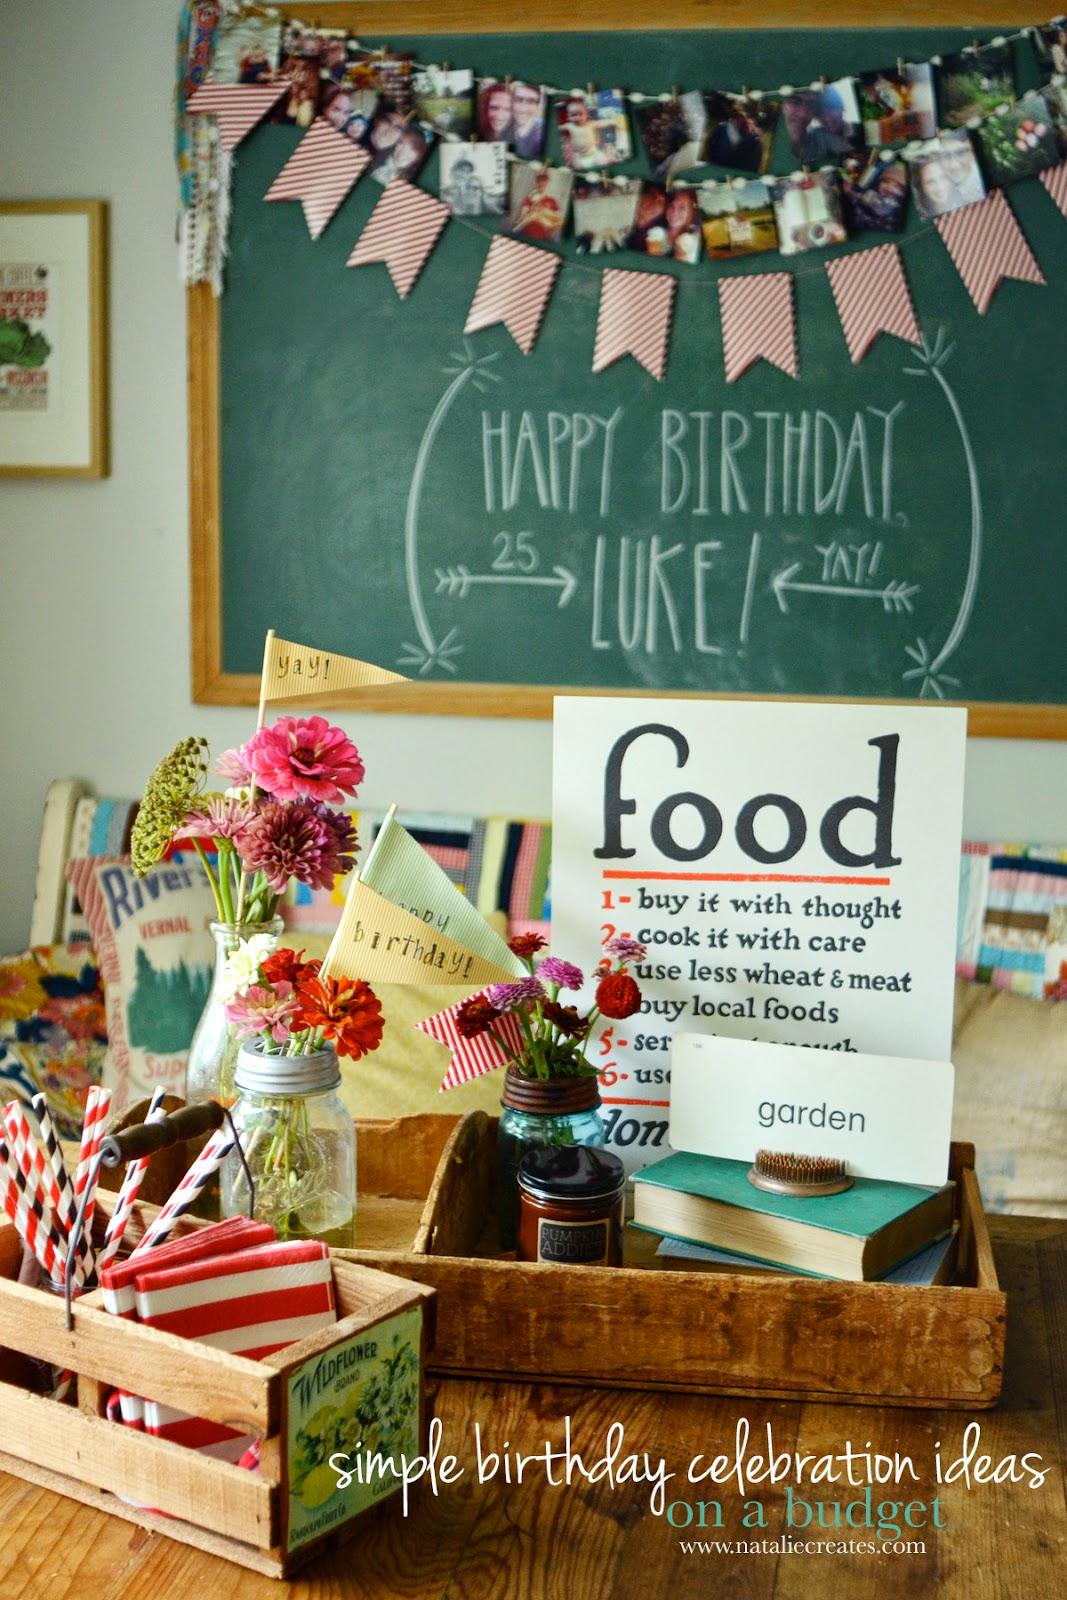 natalie creates: simple birthday celebration ideas on a budget